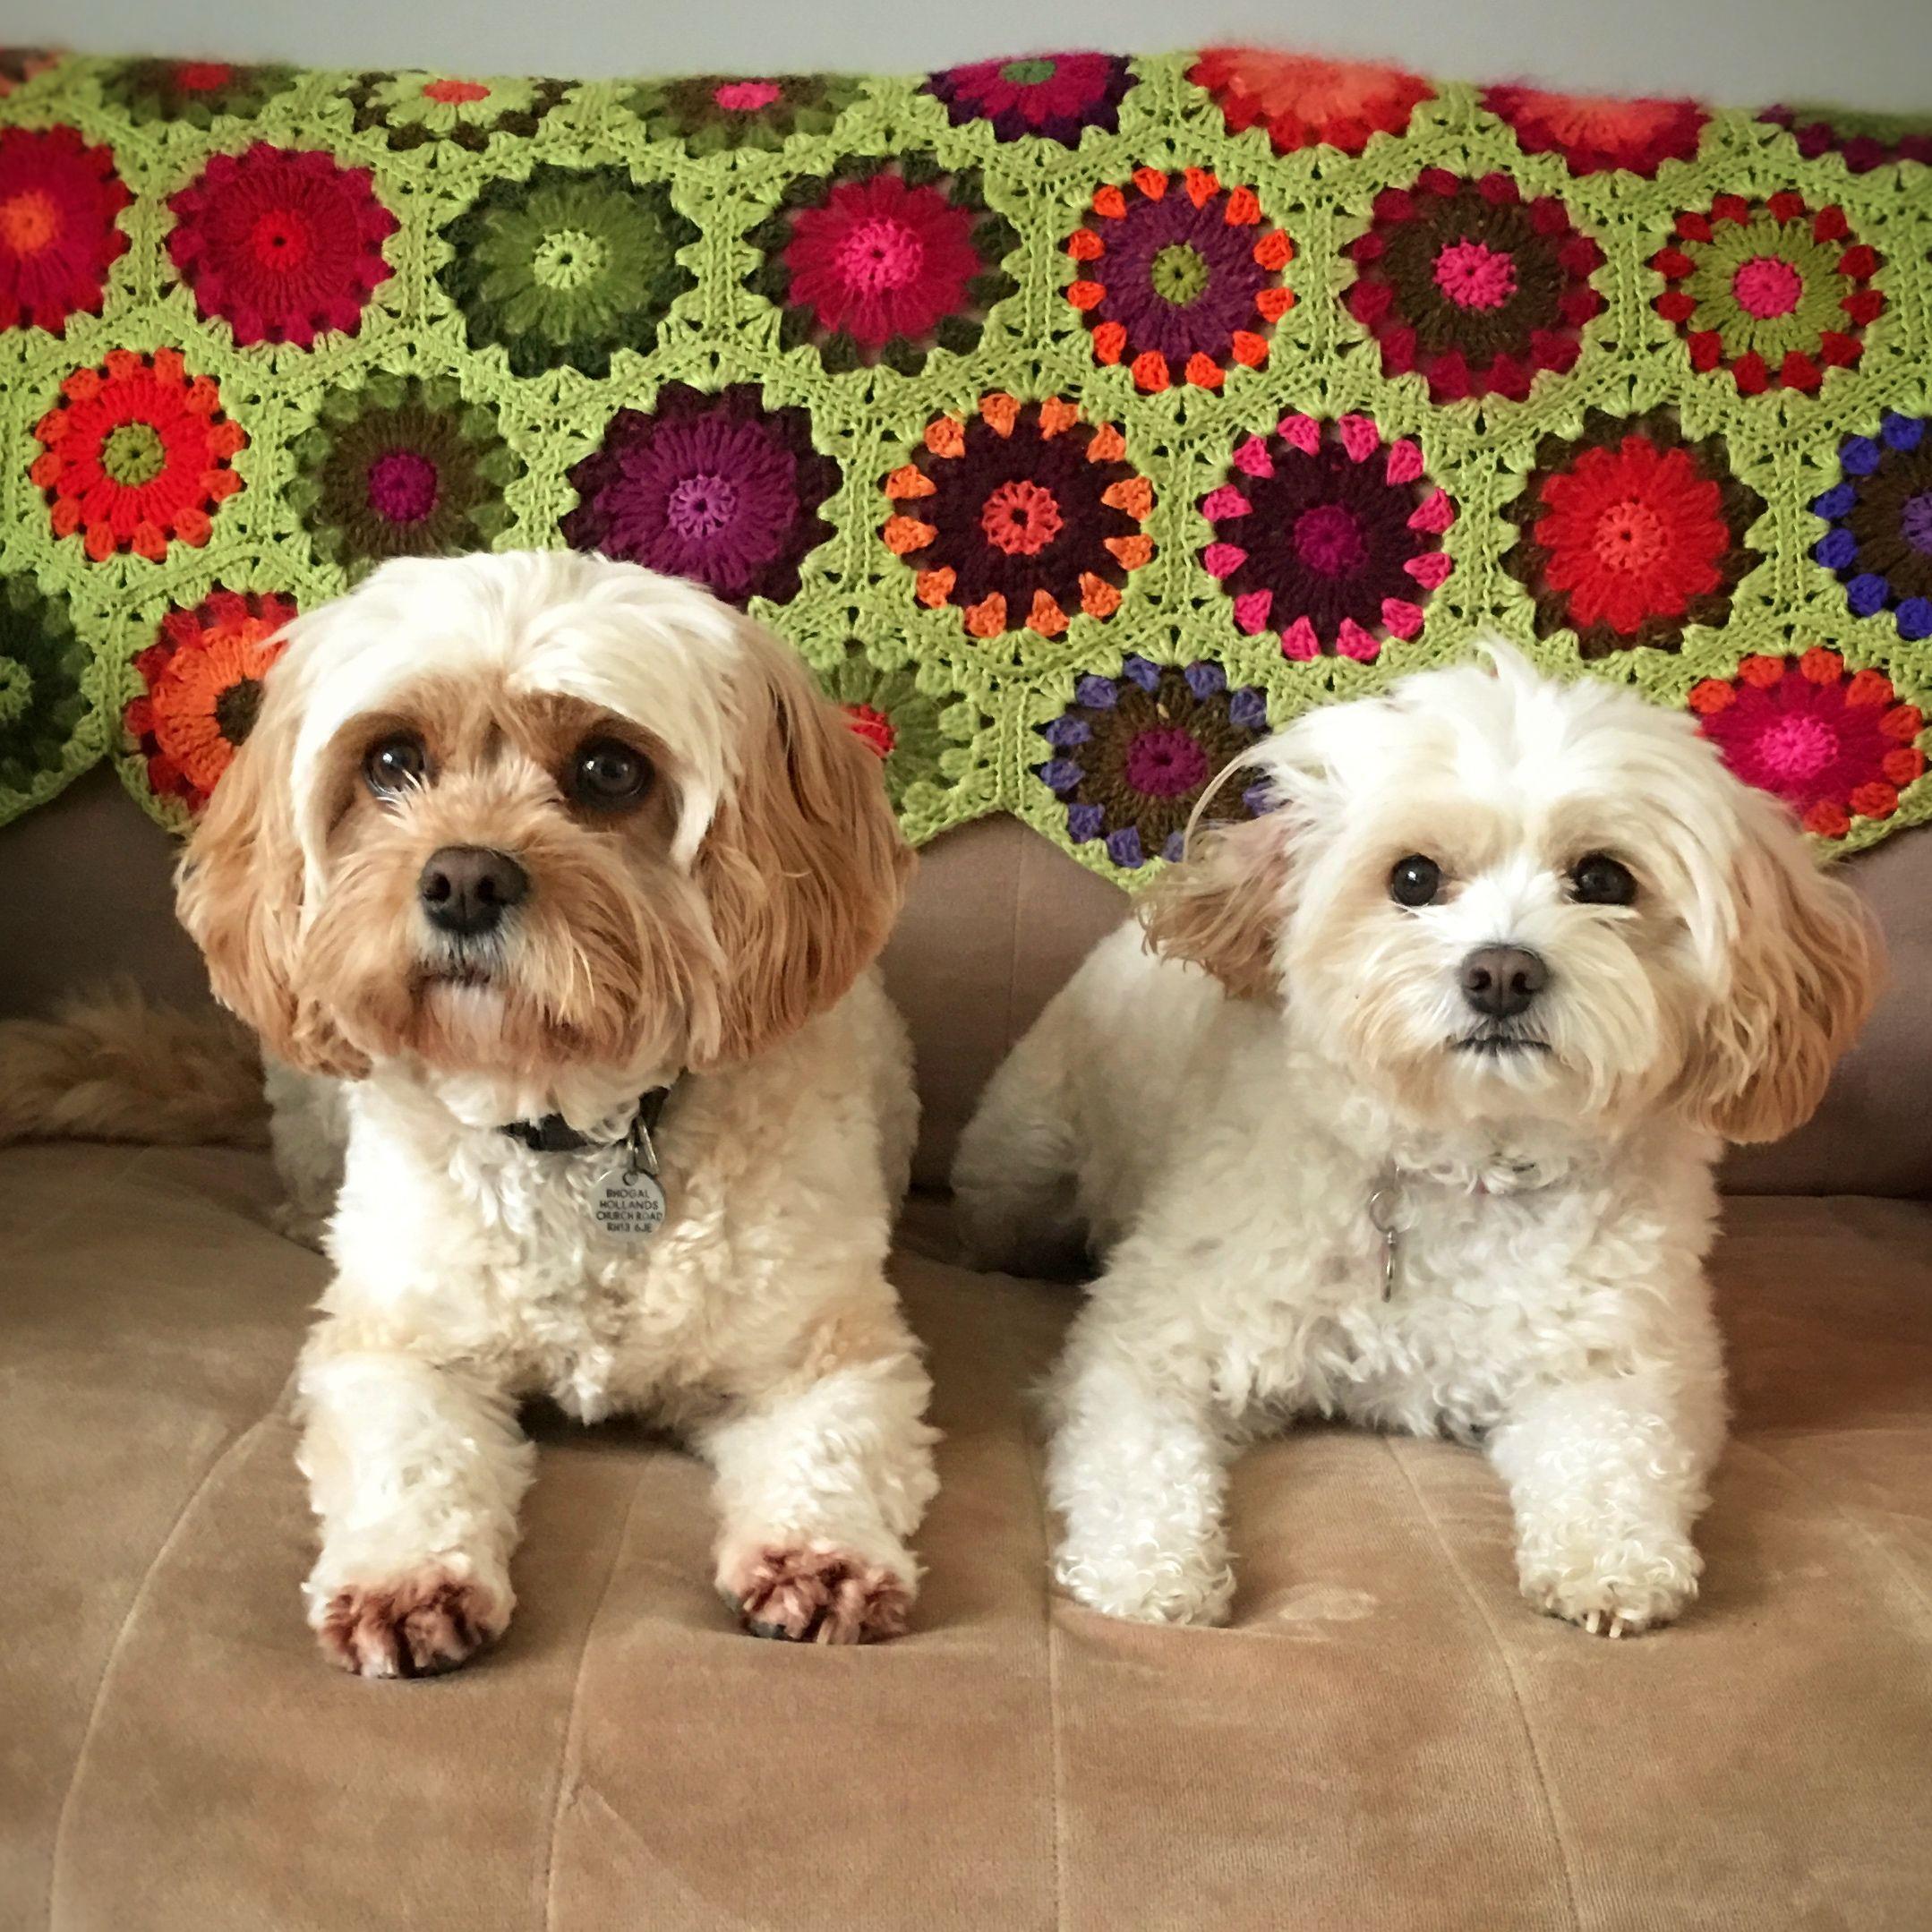 Me + Effie = Double trouble! Beautiful dogs, Cavapoo